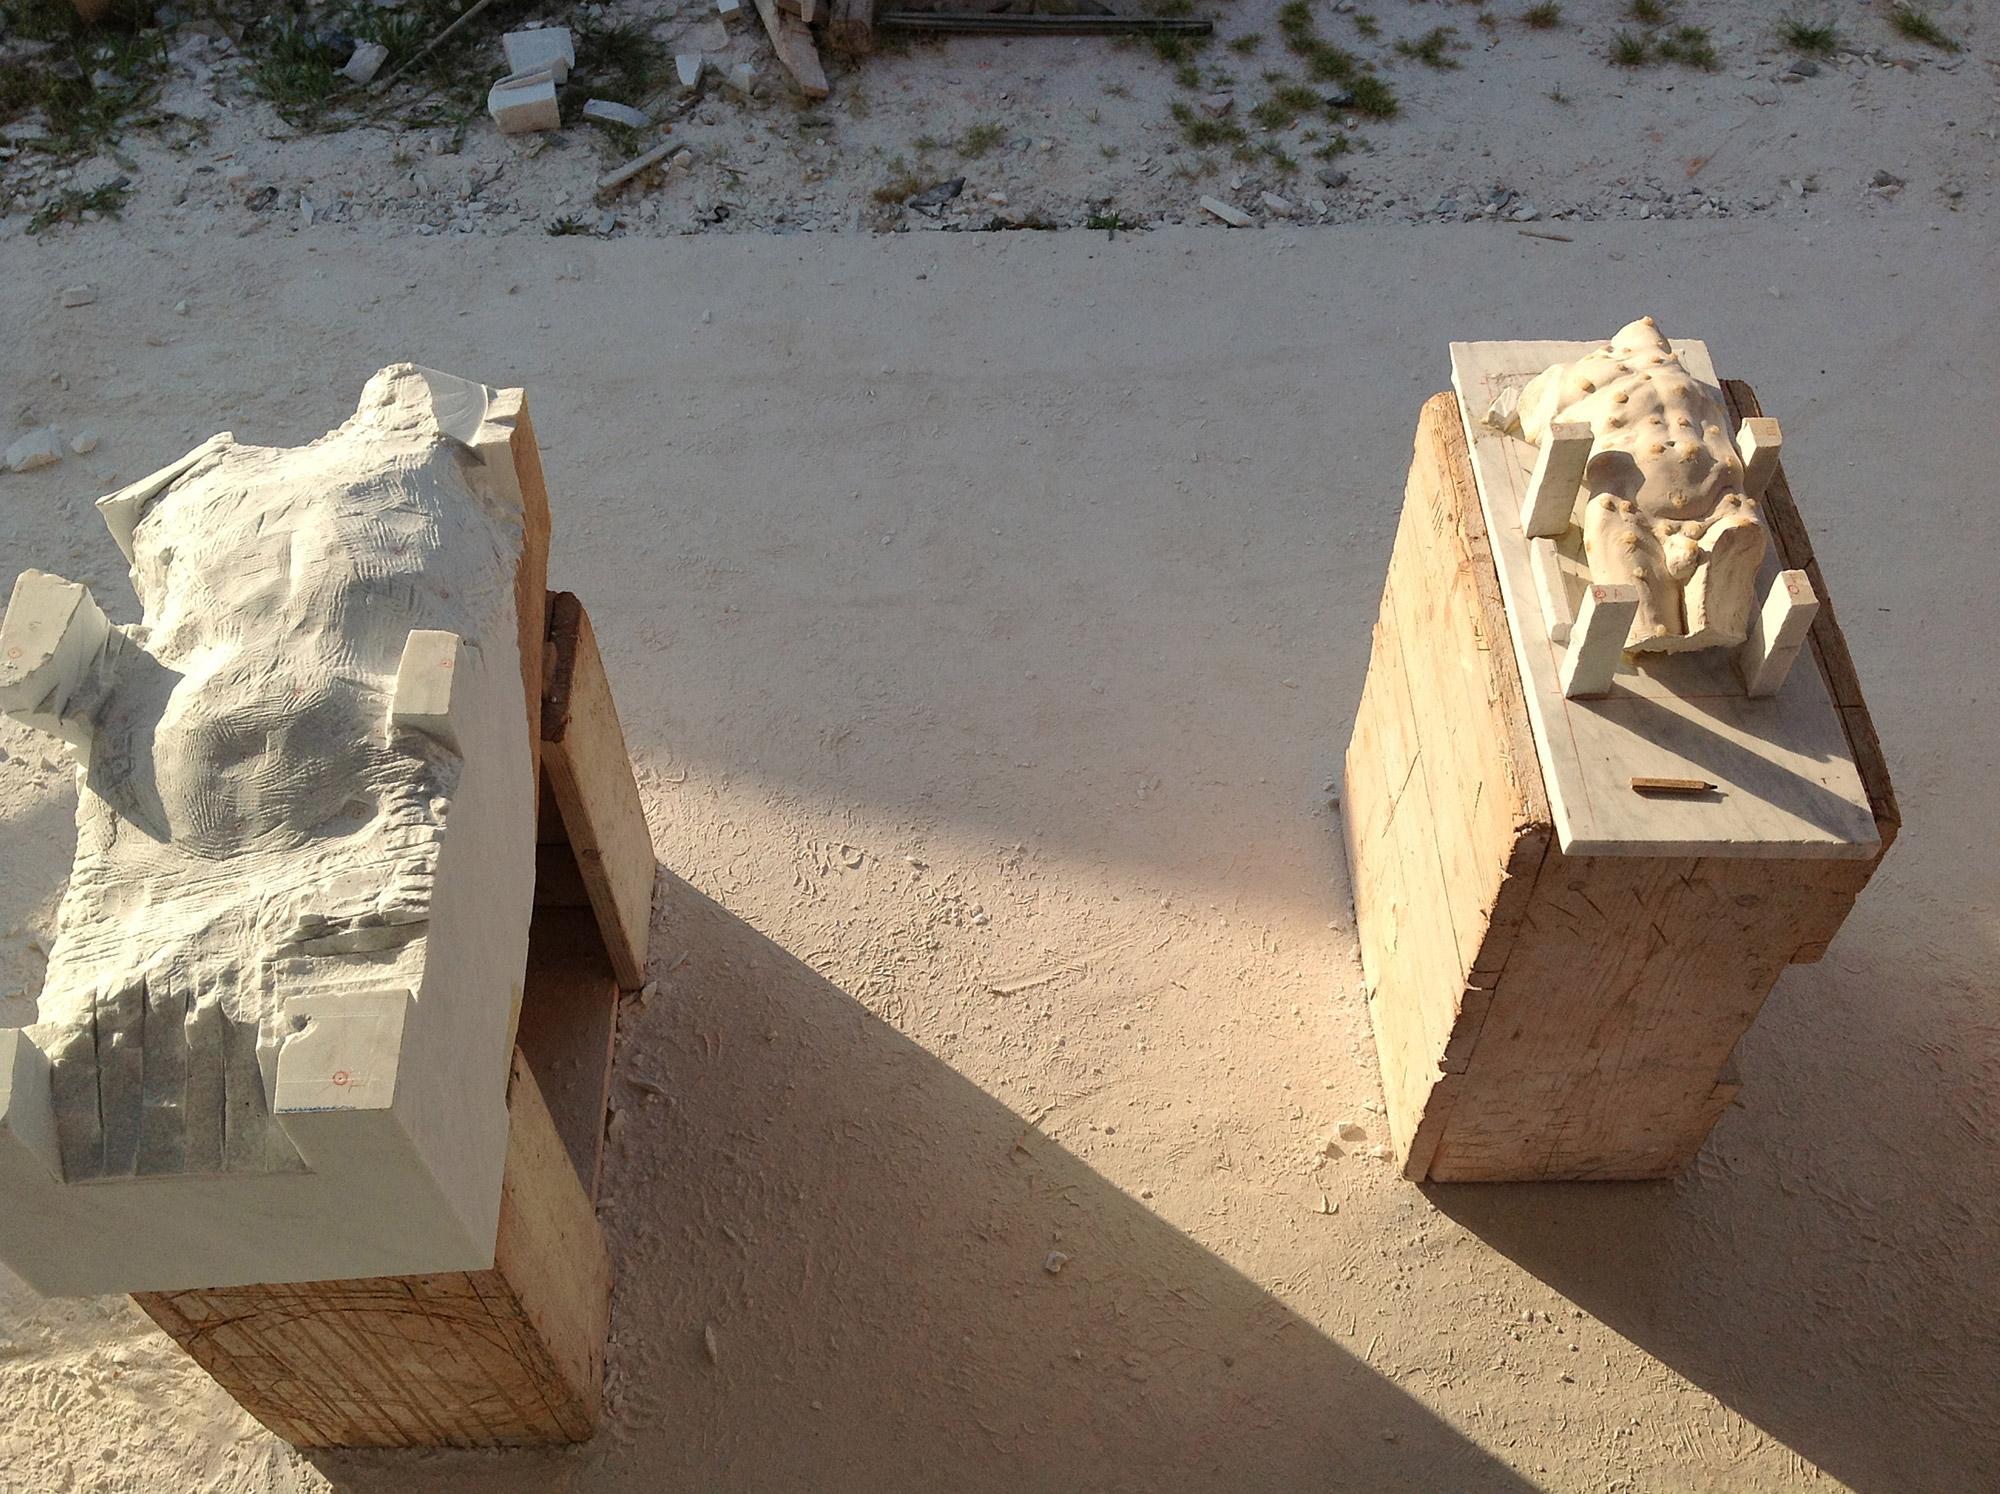 New-York-Academy-of-Art-Carrara-Residency-Joseph-Brickey20171213_0098.jpg